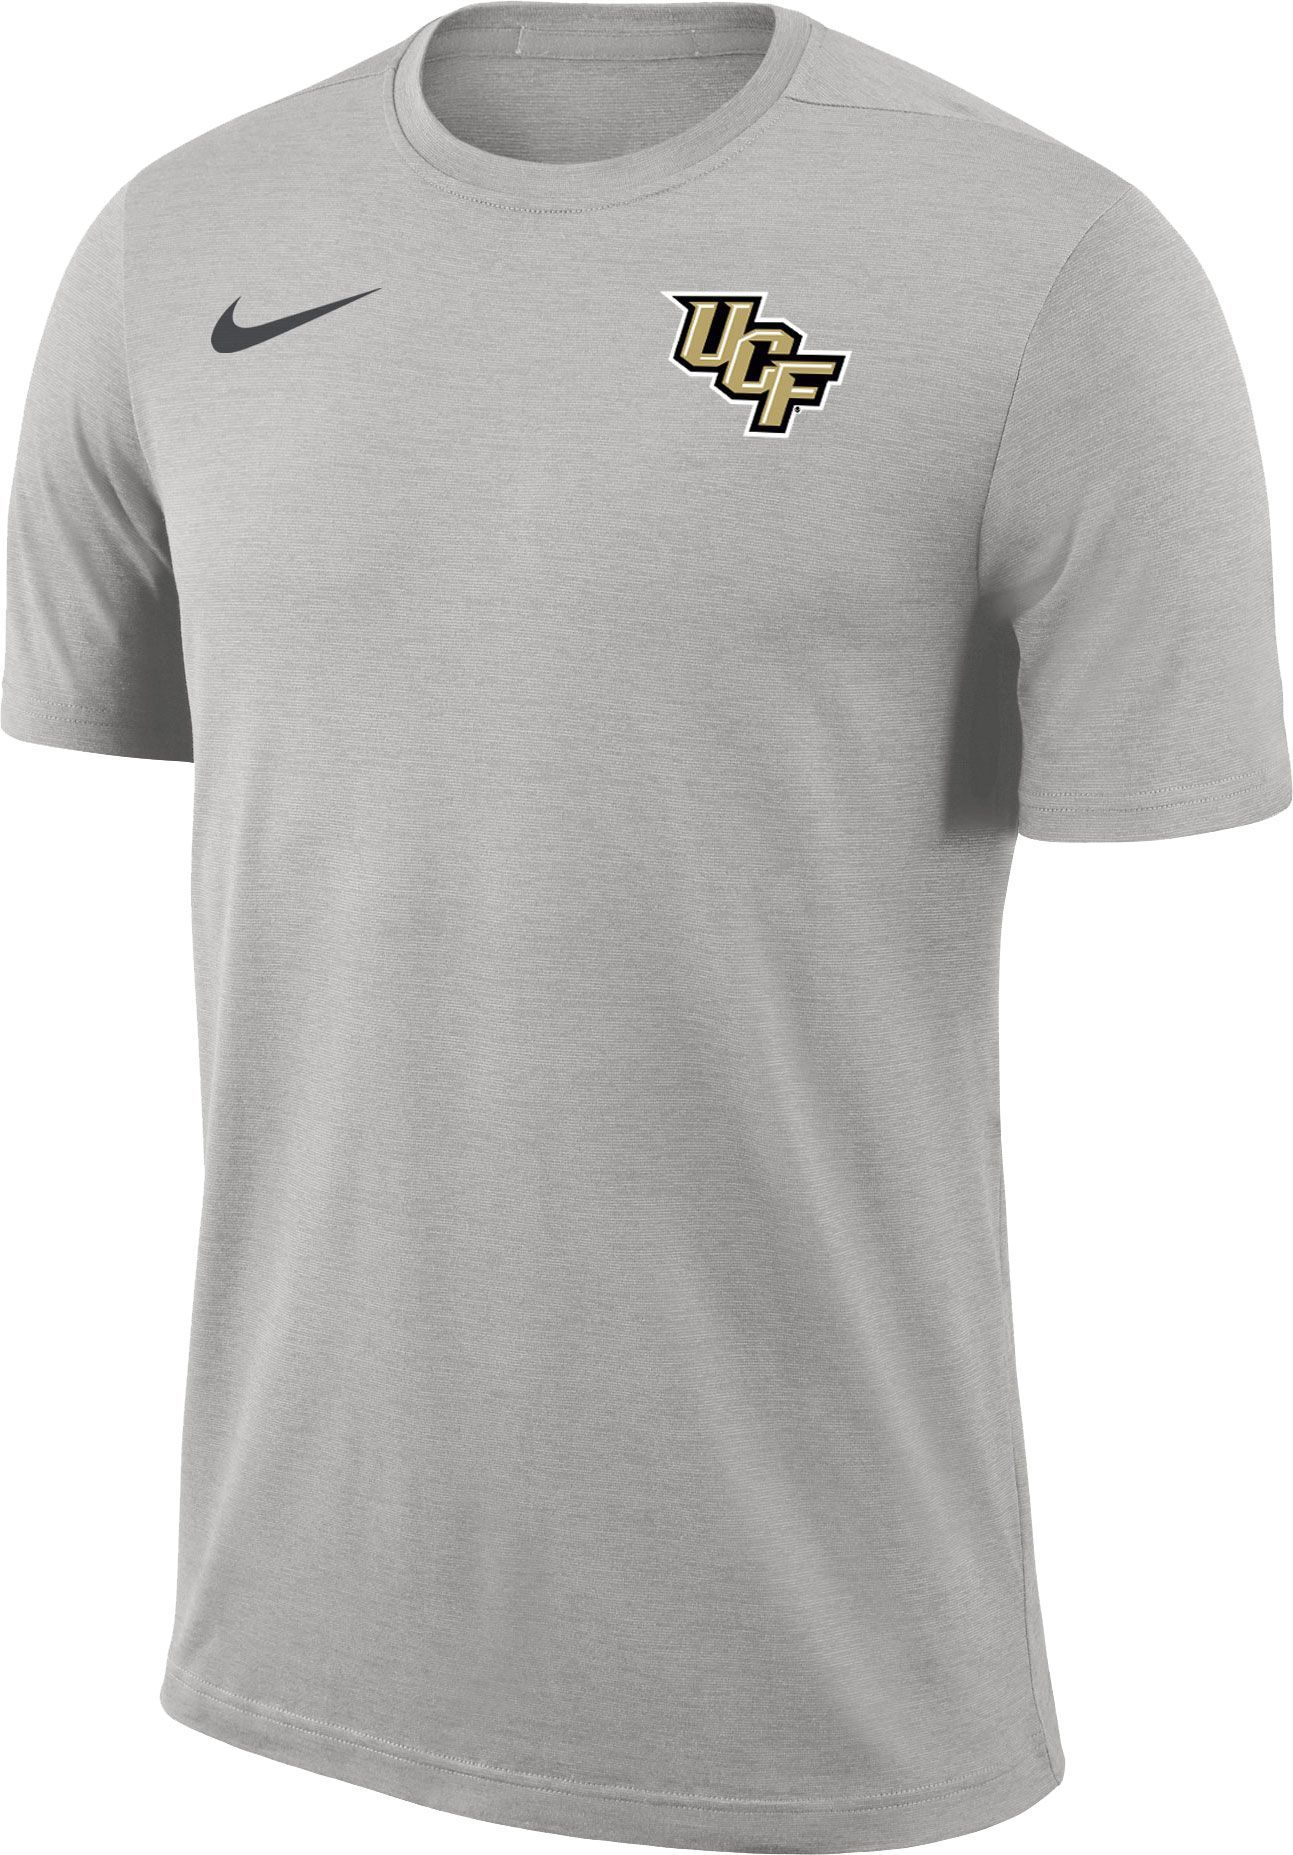 7d8932554 Nike Men's UCF Knights Grey Coach Football T-Shirt | Products | Nike ...